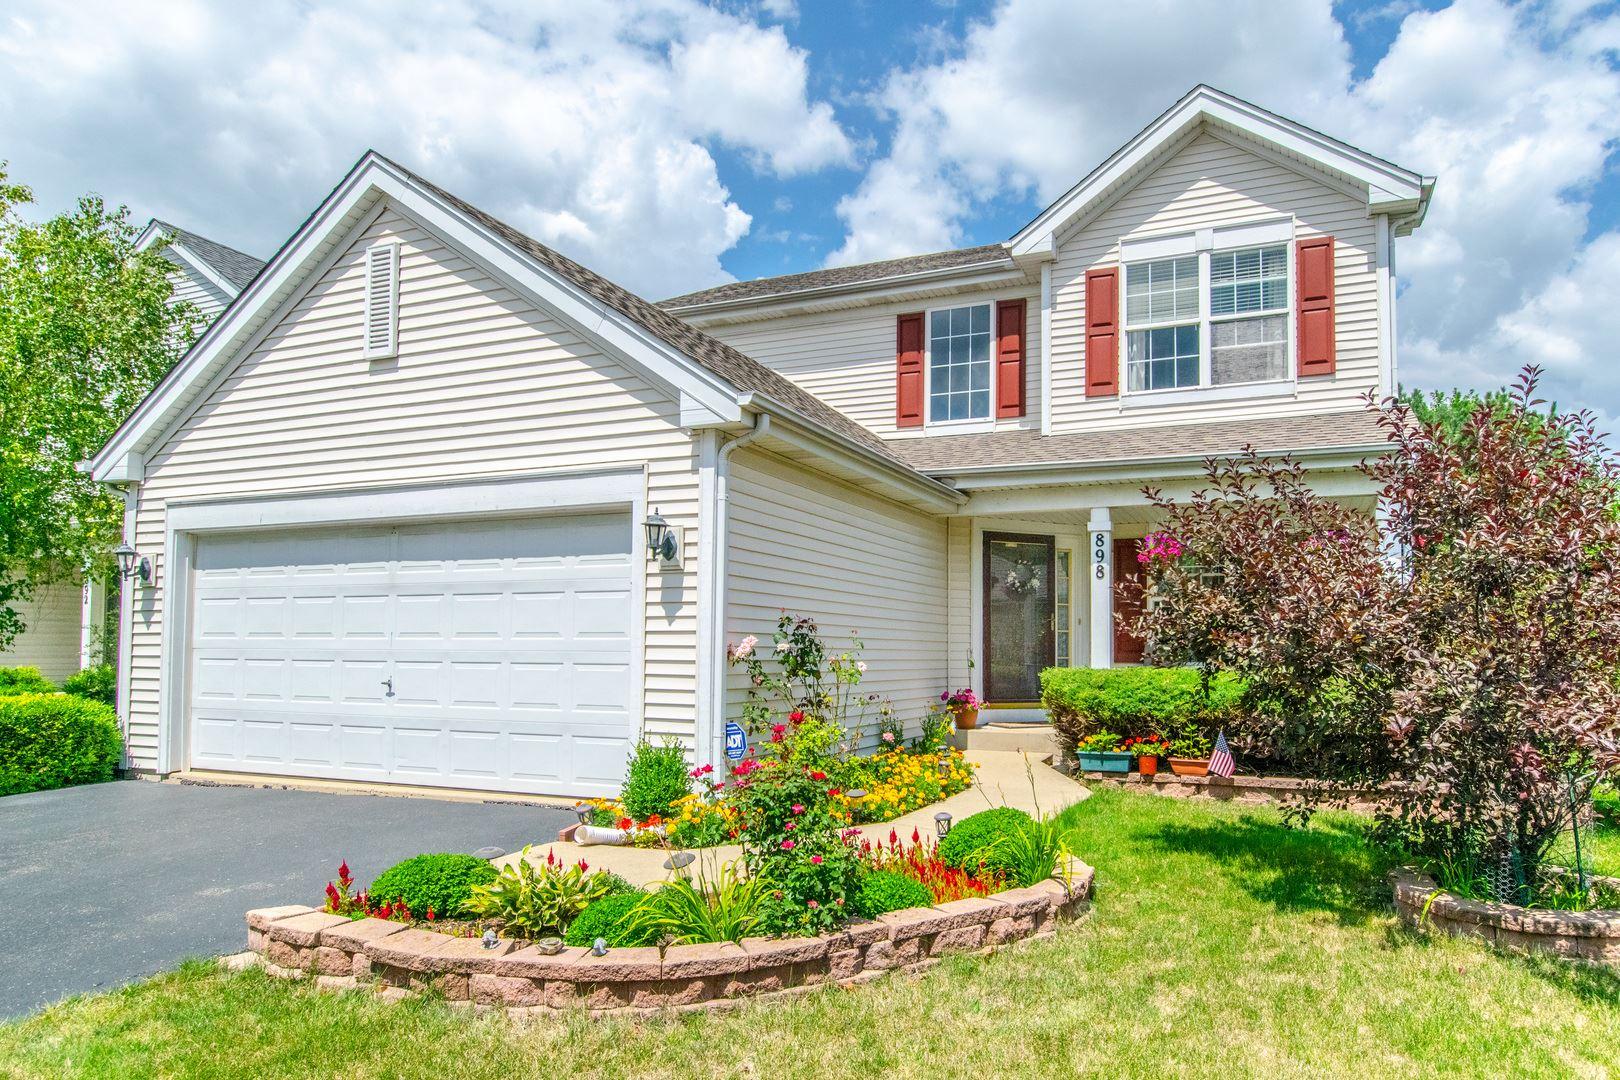 898 Lakestone Lane, Aurora, IL 60504 - #: 10811195